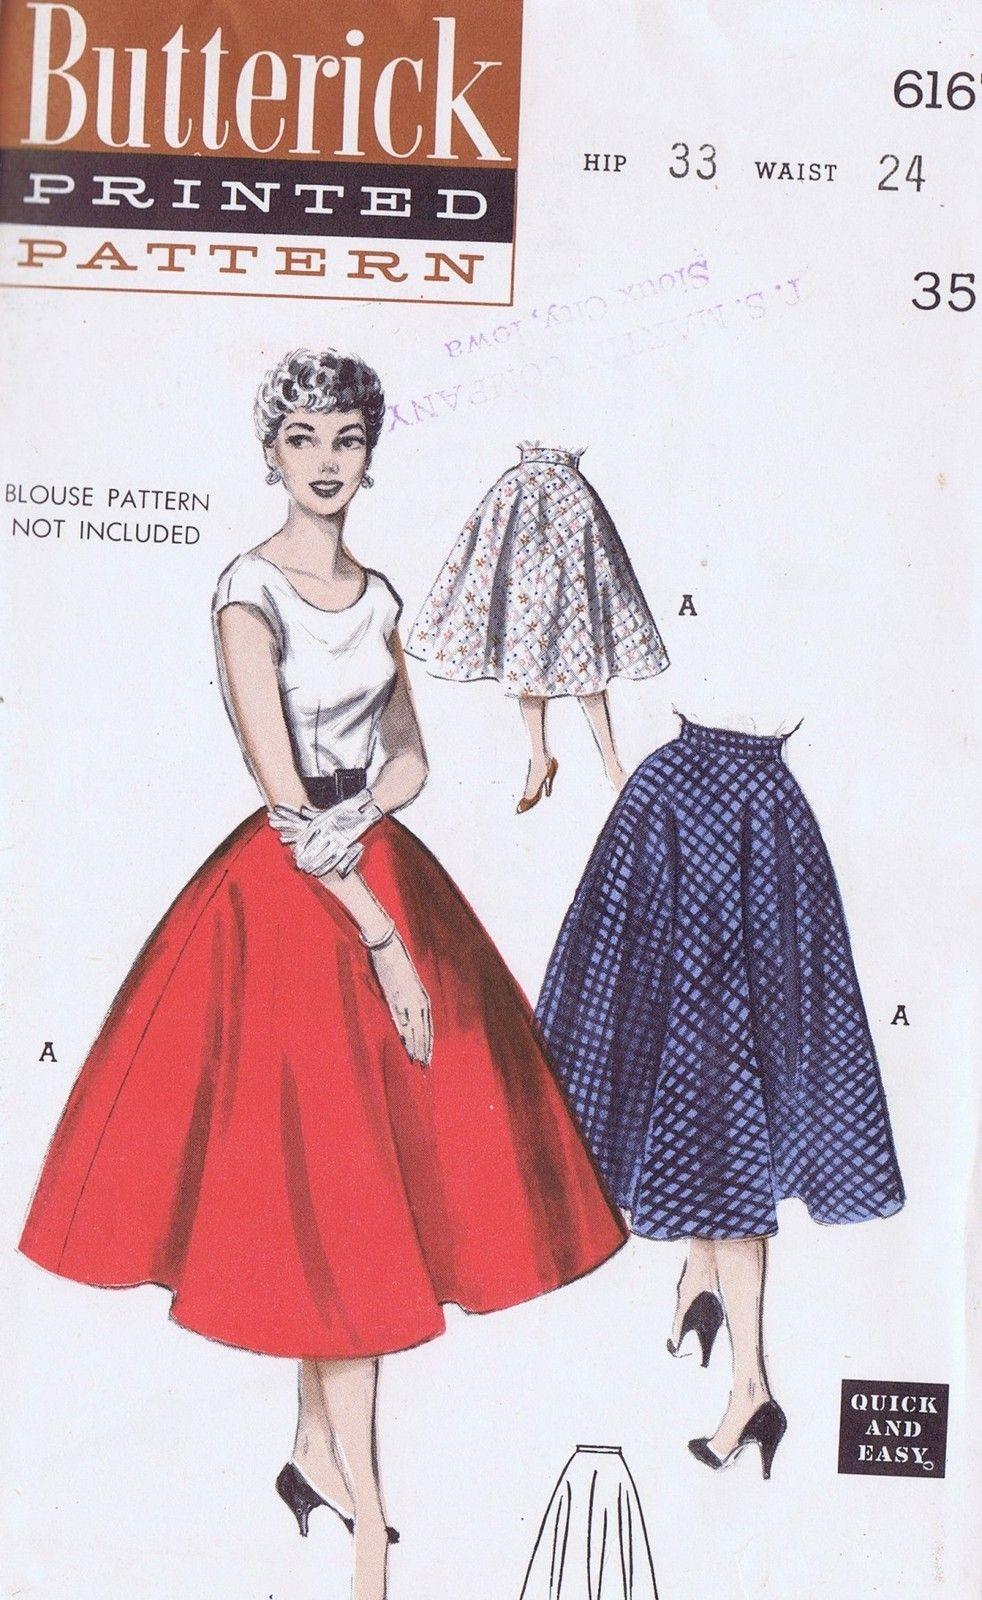 VINTAGE SKIRT SEWING PATTERN 6167 BUTTERICK 1950s SIZE 12 WAIST 24 ...